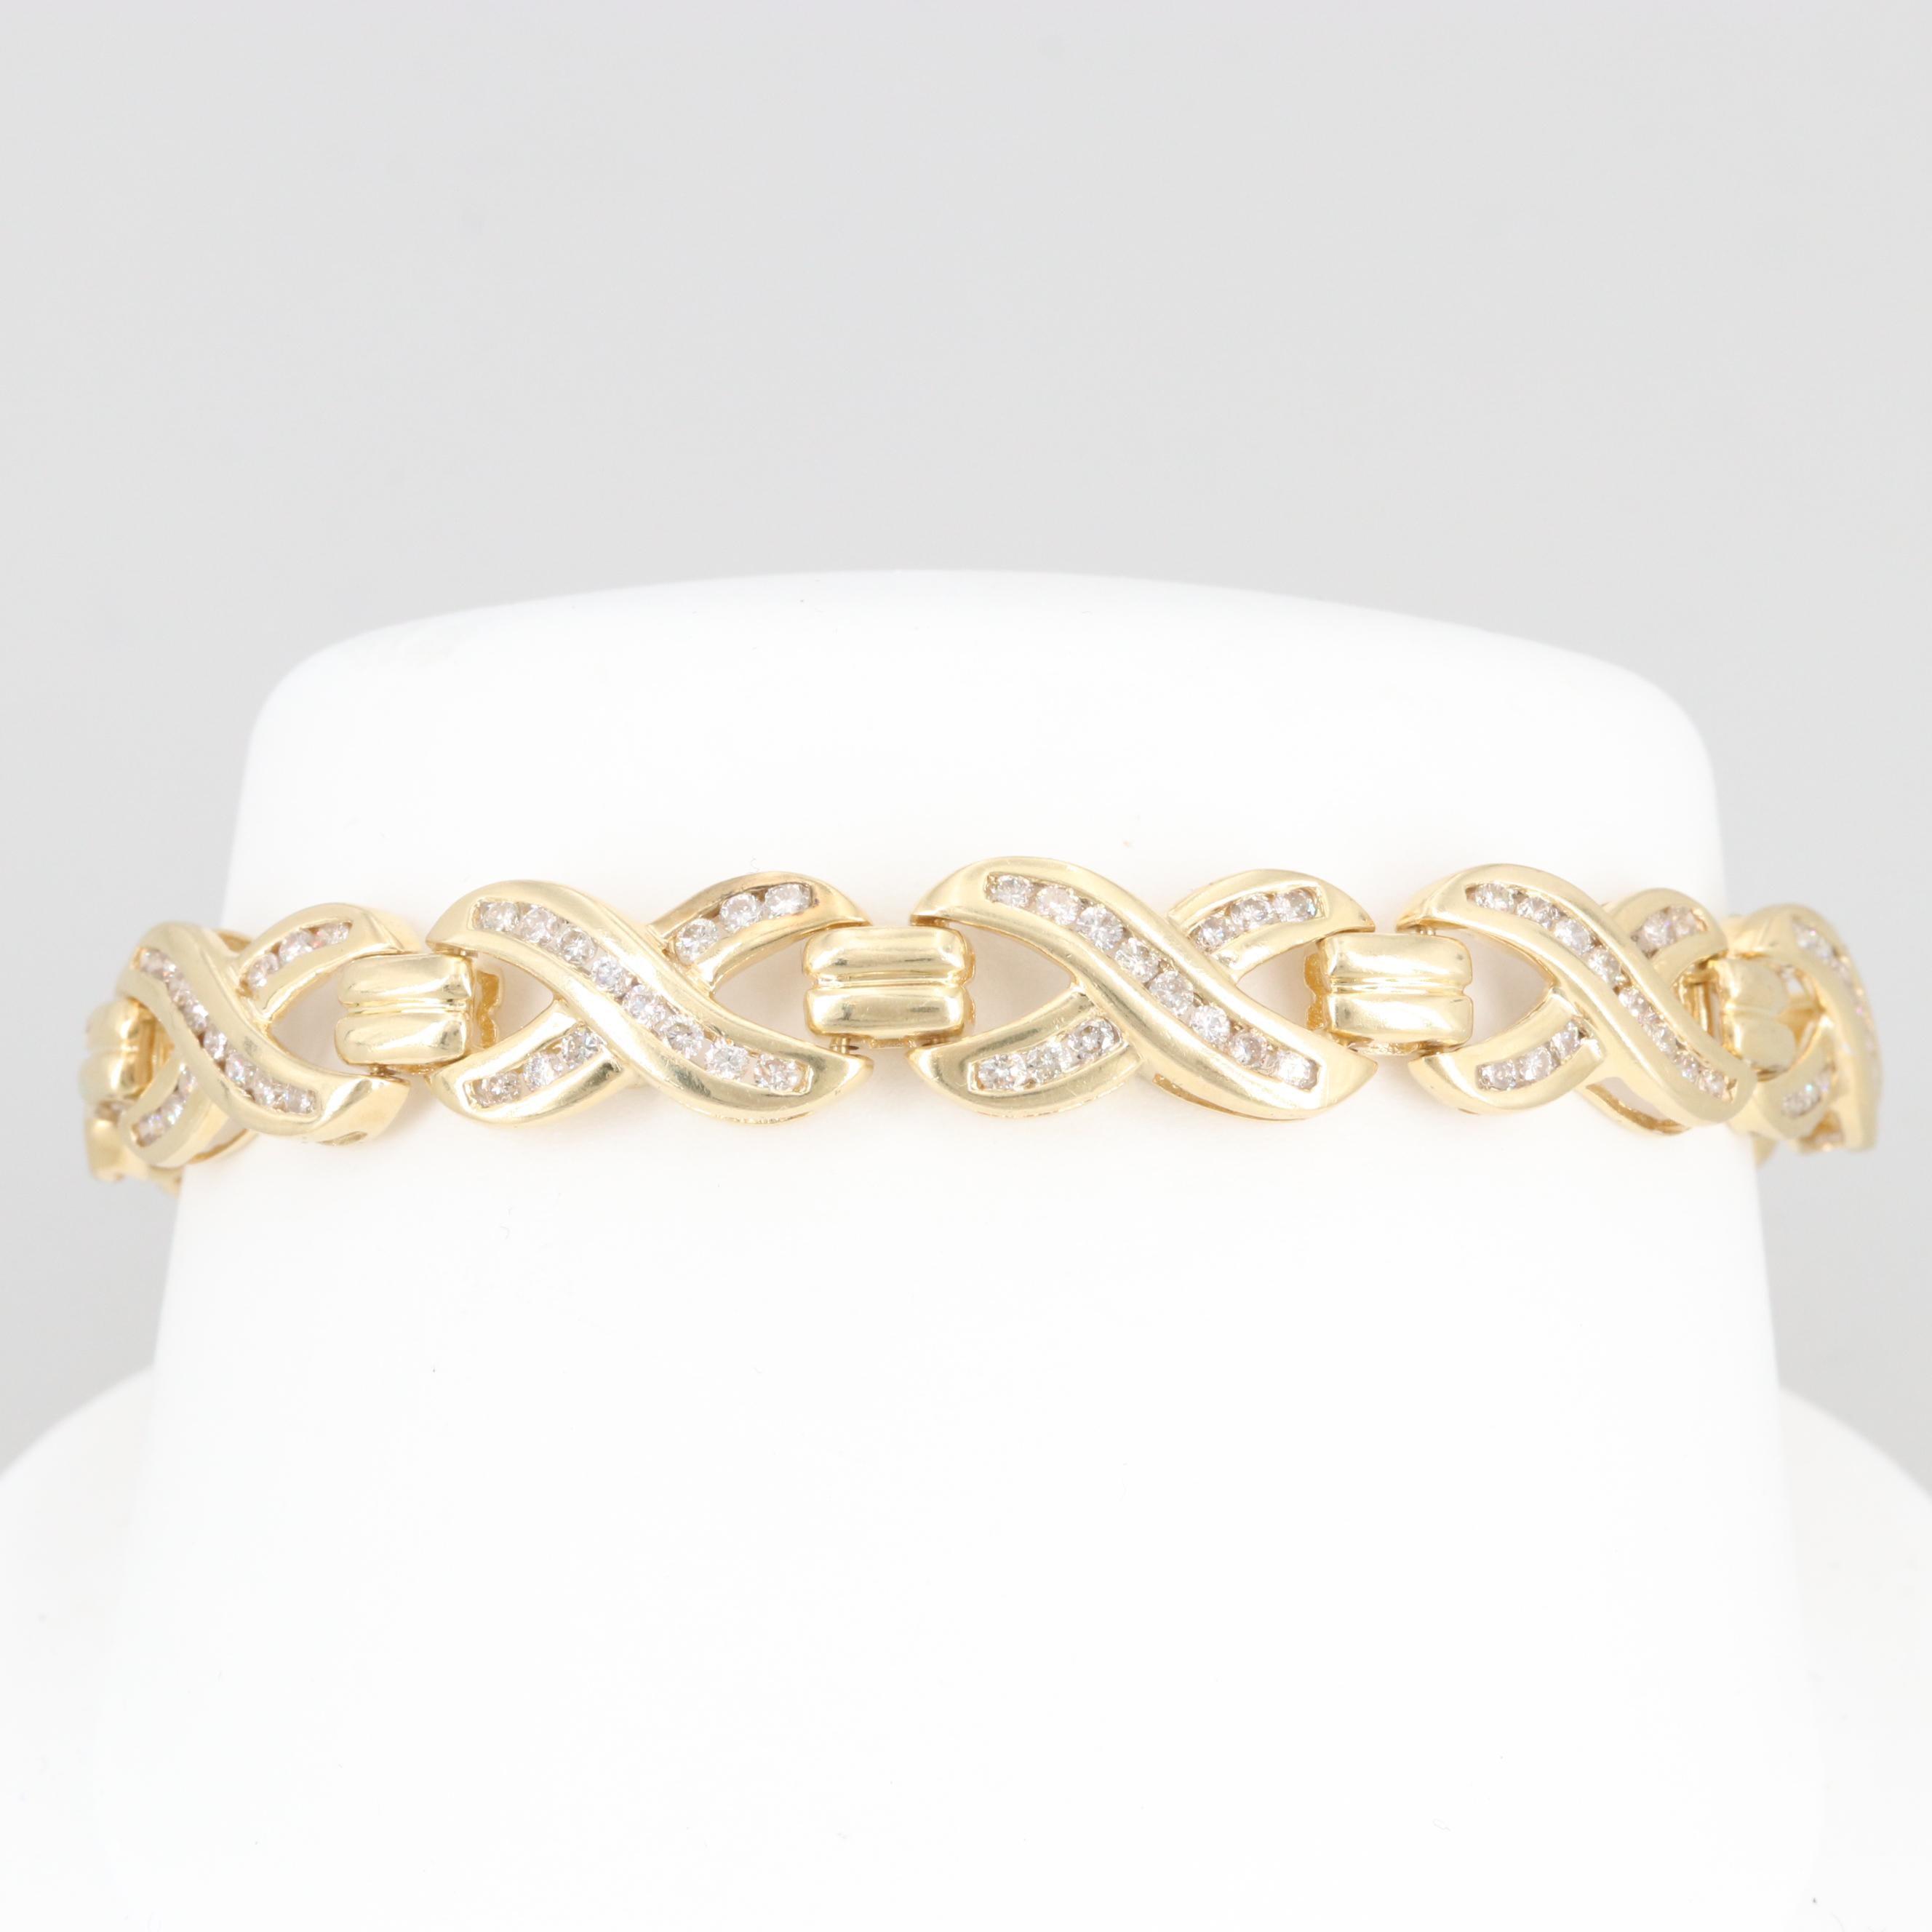 14K Yellow Gold 2.10 CTW Diamond Bracelet